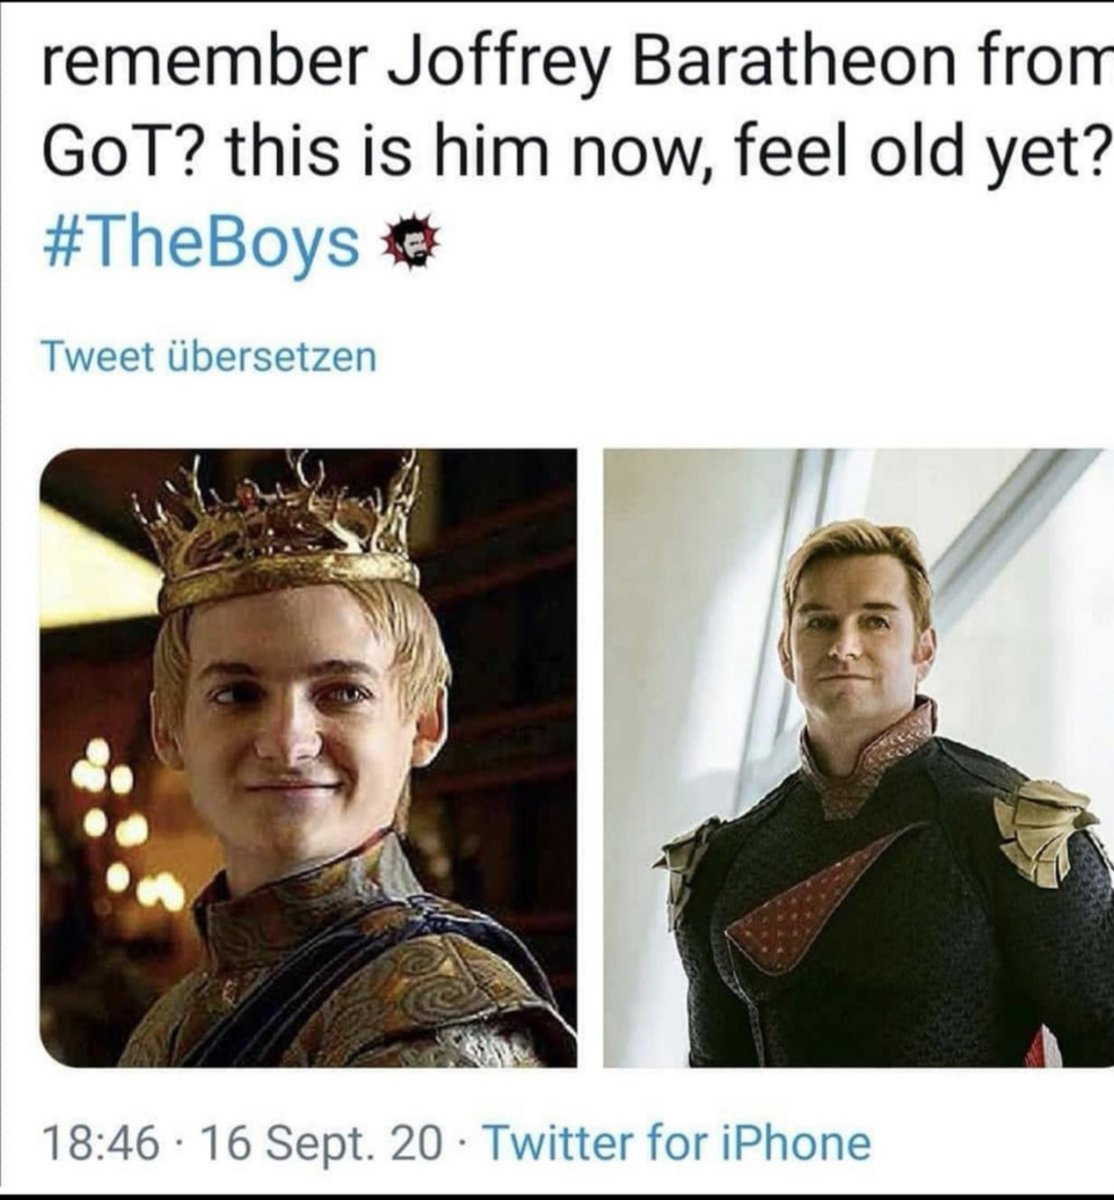 Omfg 😬🤮 #GOT #Theboys https://t.co/DPi1tQguSm